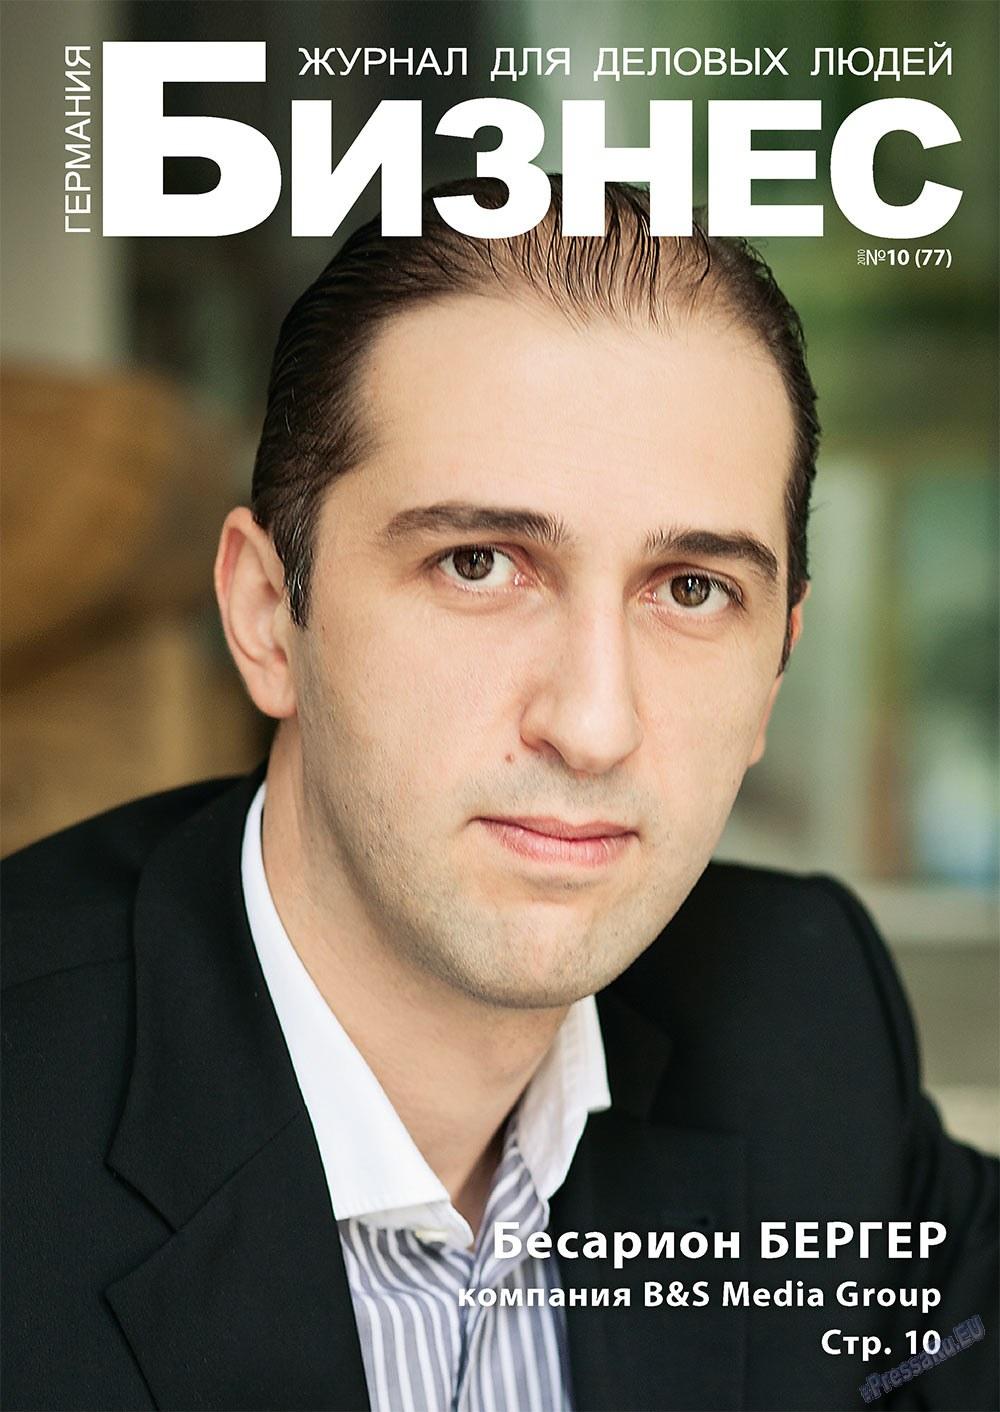 Бизнес (журнал). 2010 год, номер 10, стр. 1